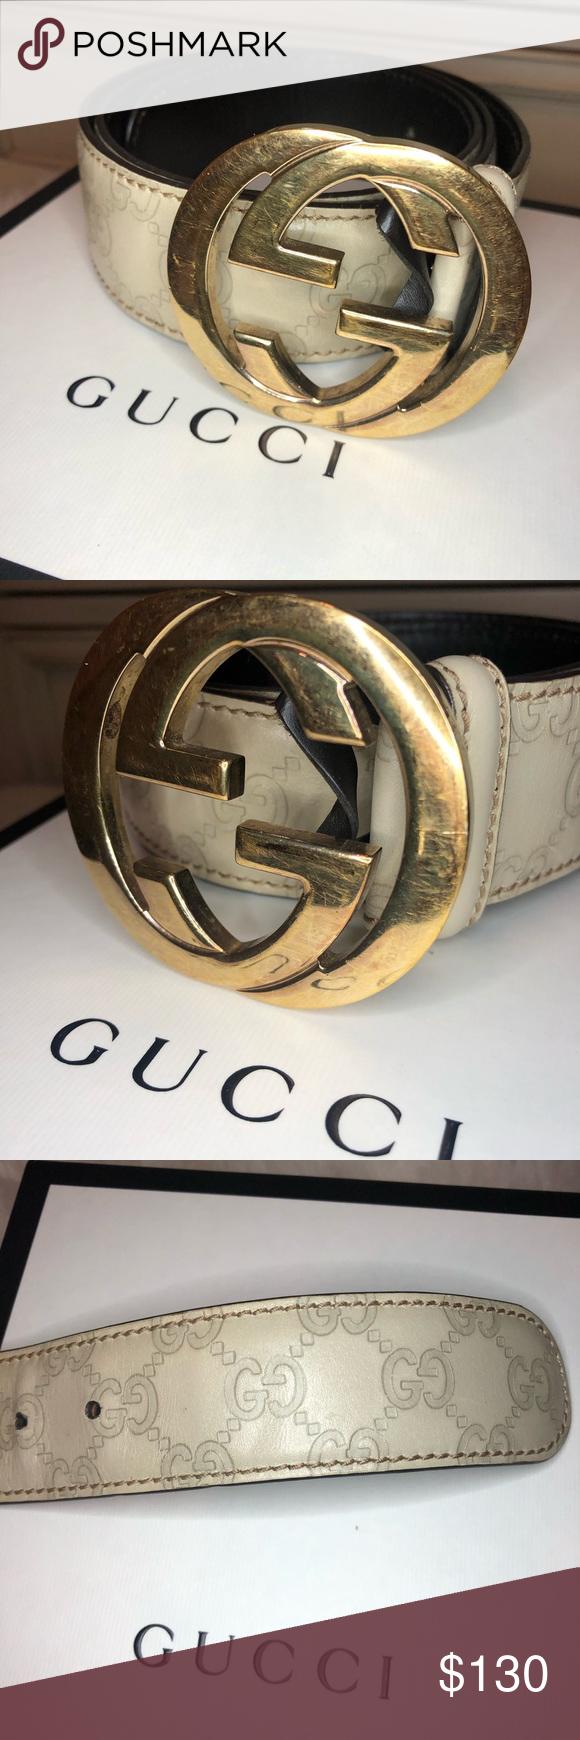 Ivory Gucci Belt Gucci Belt Gucci Belt